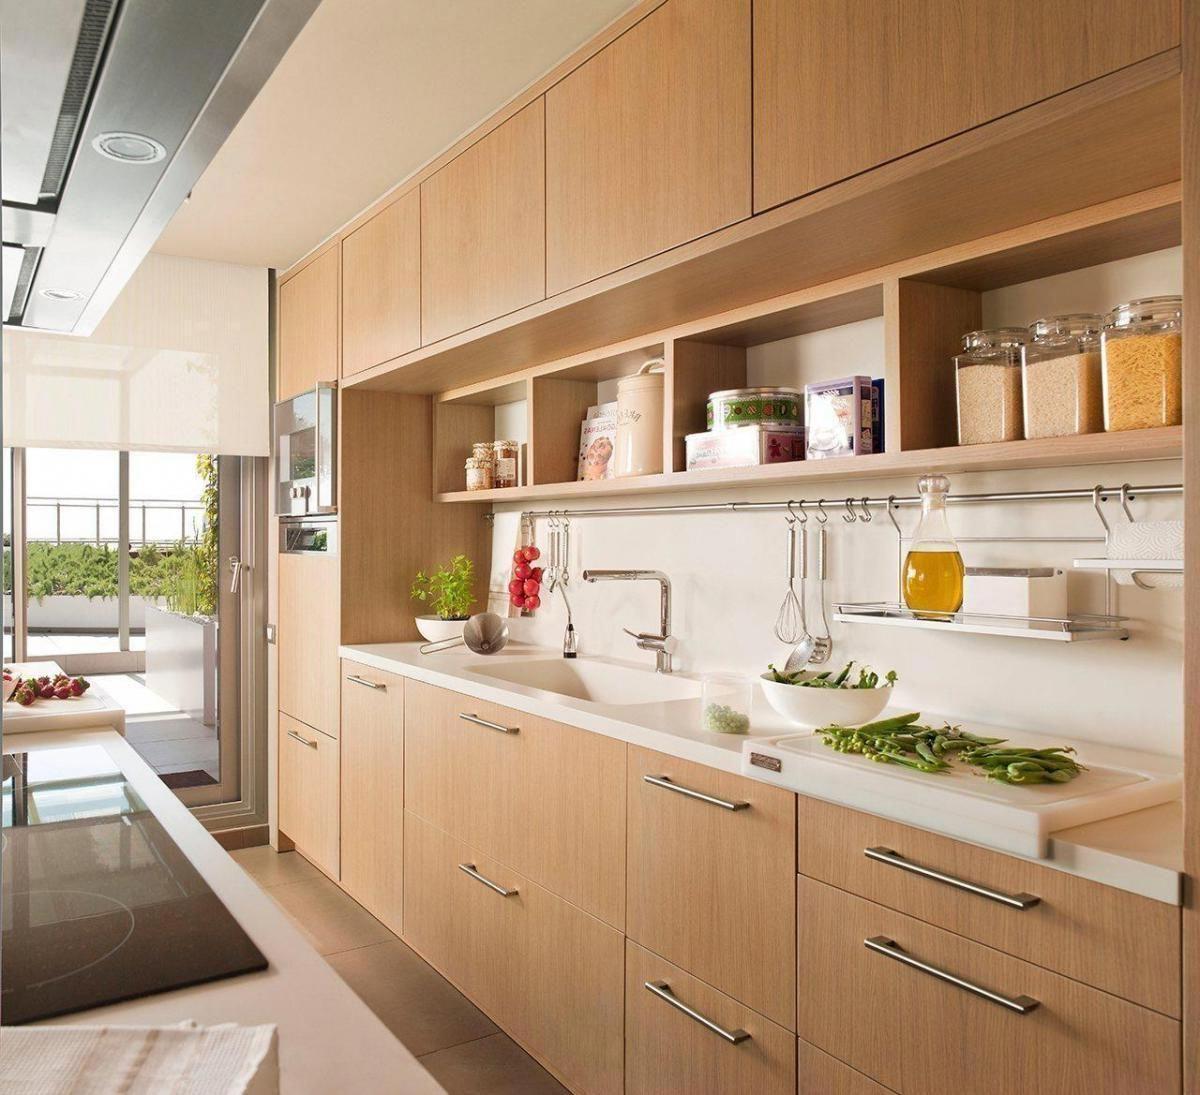 An Asianstyle room Wooden kitchen Modern